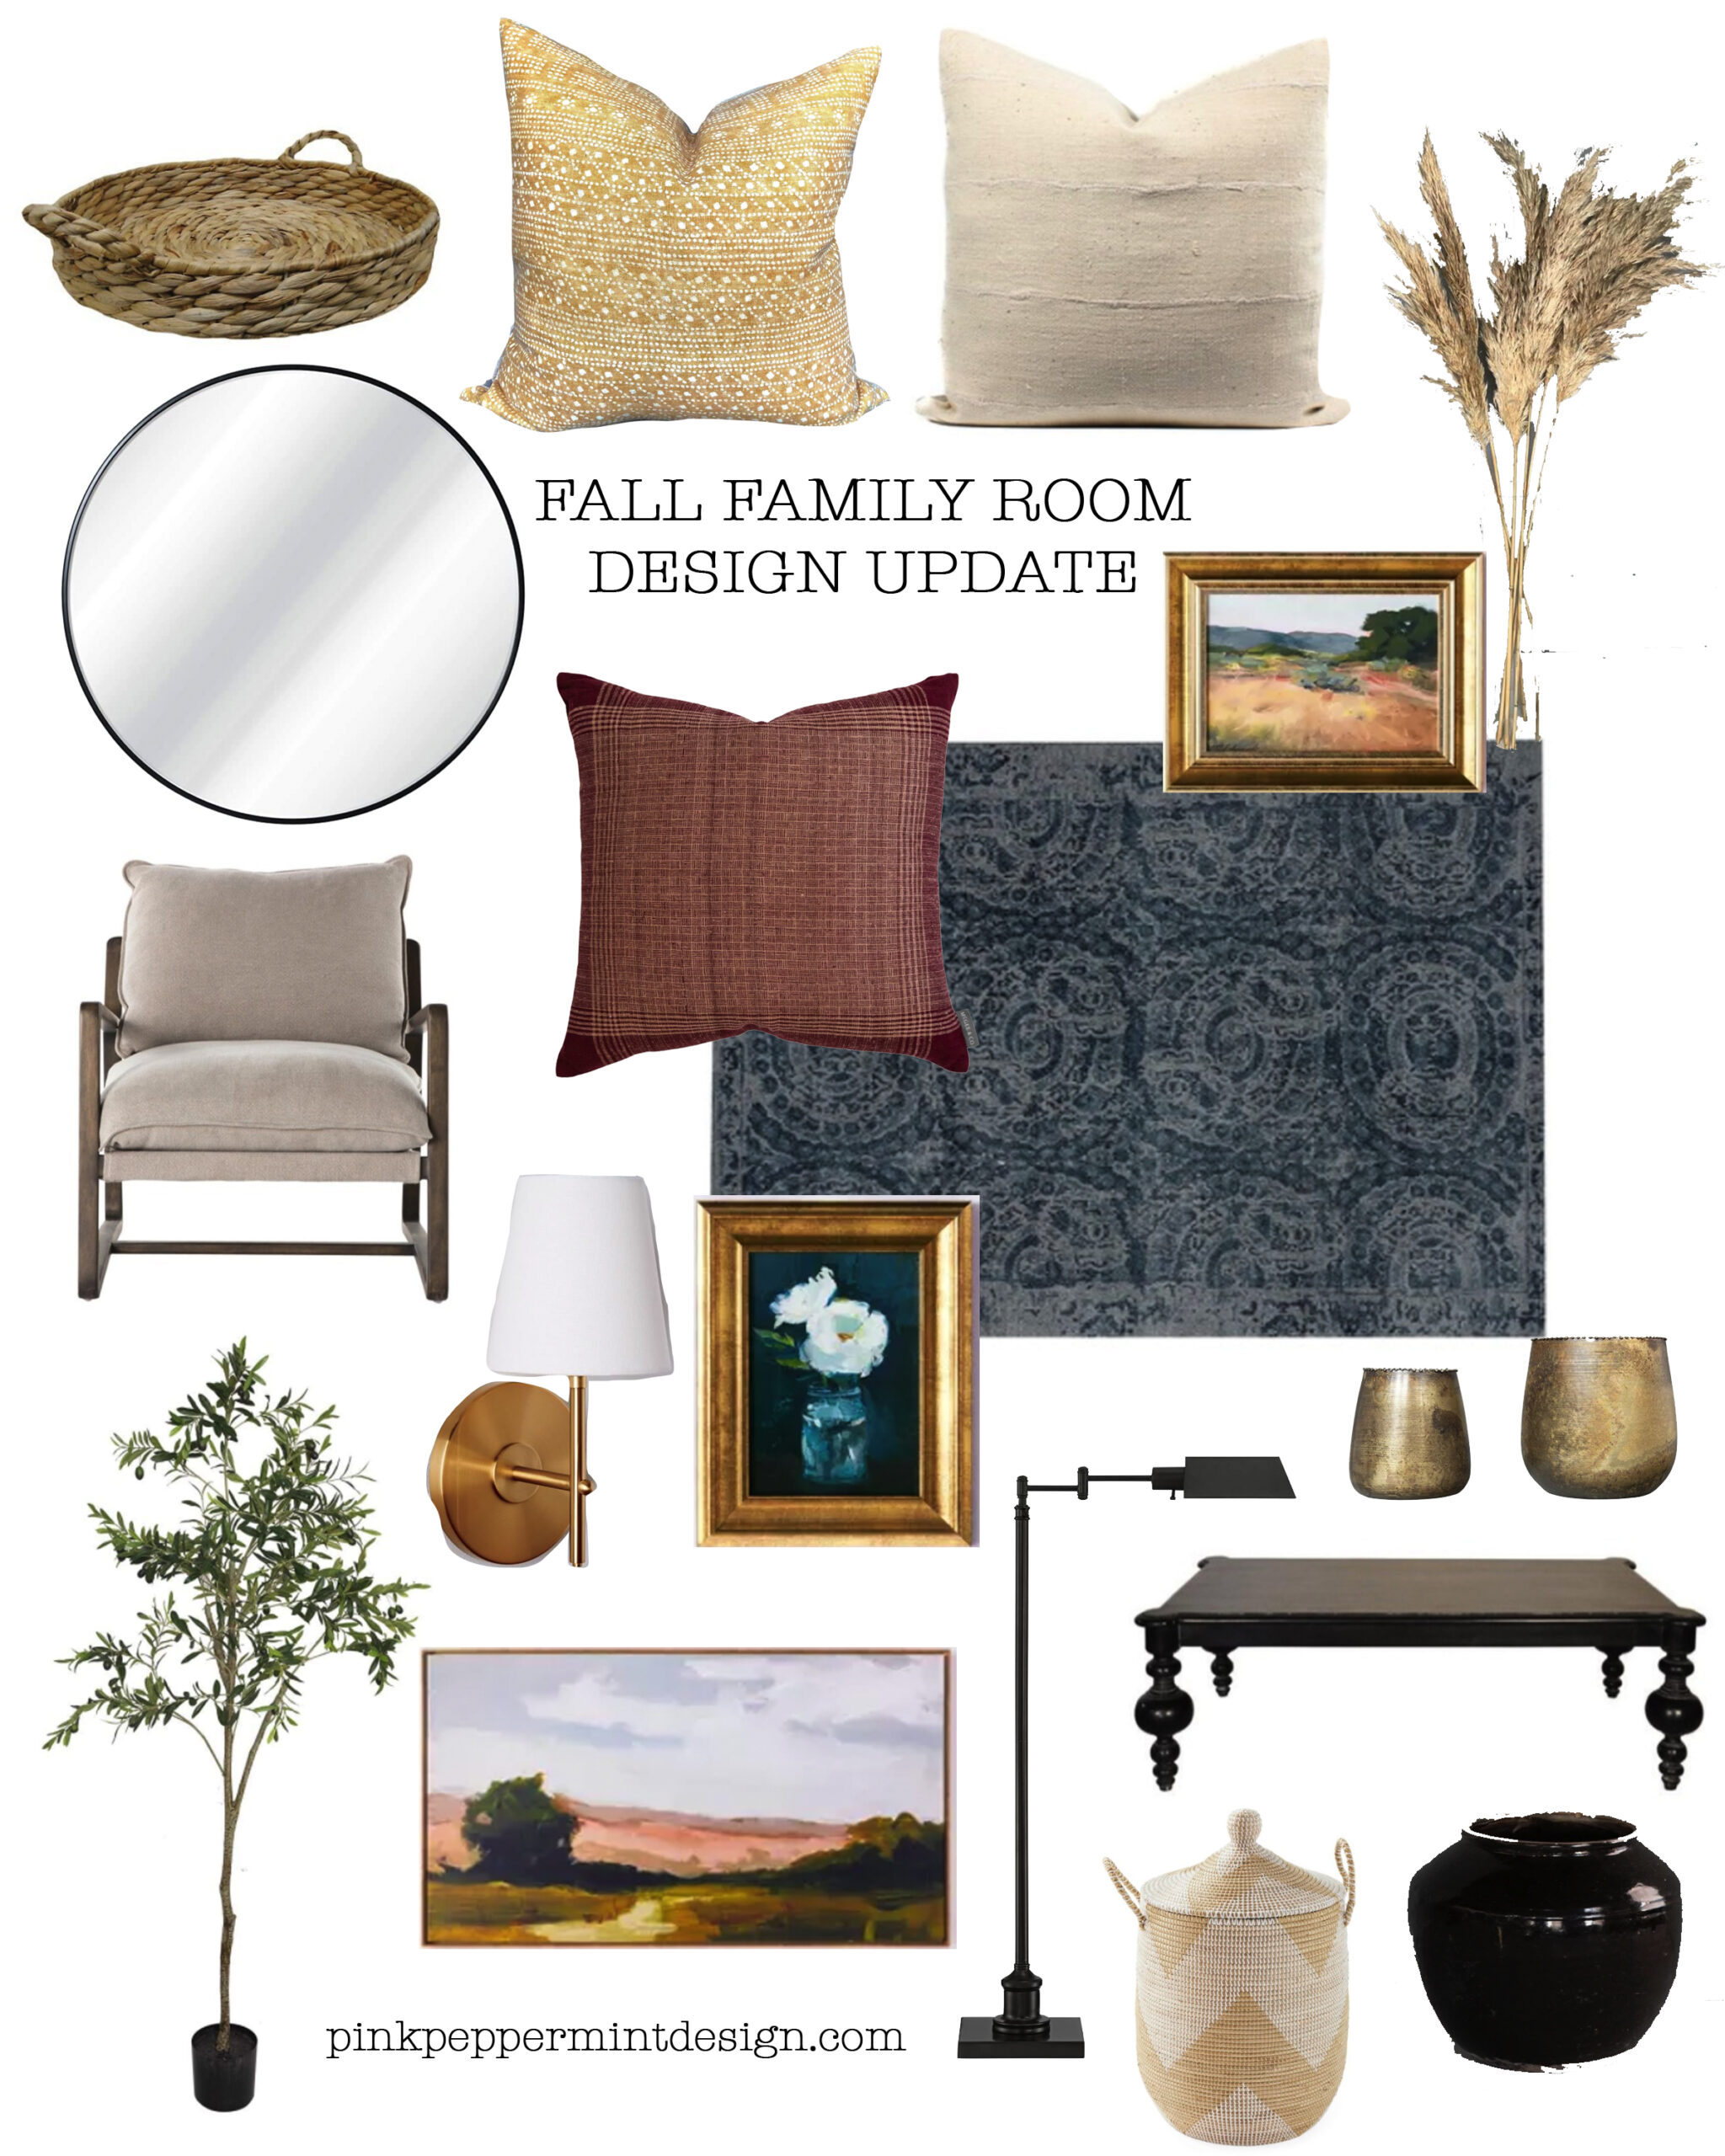 Fall family room design ideas